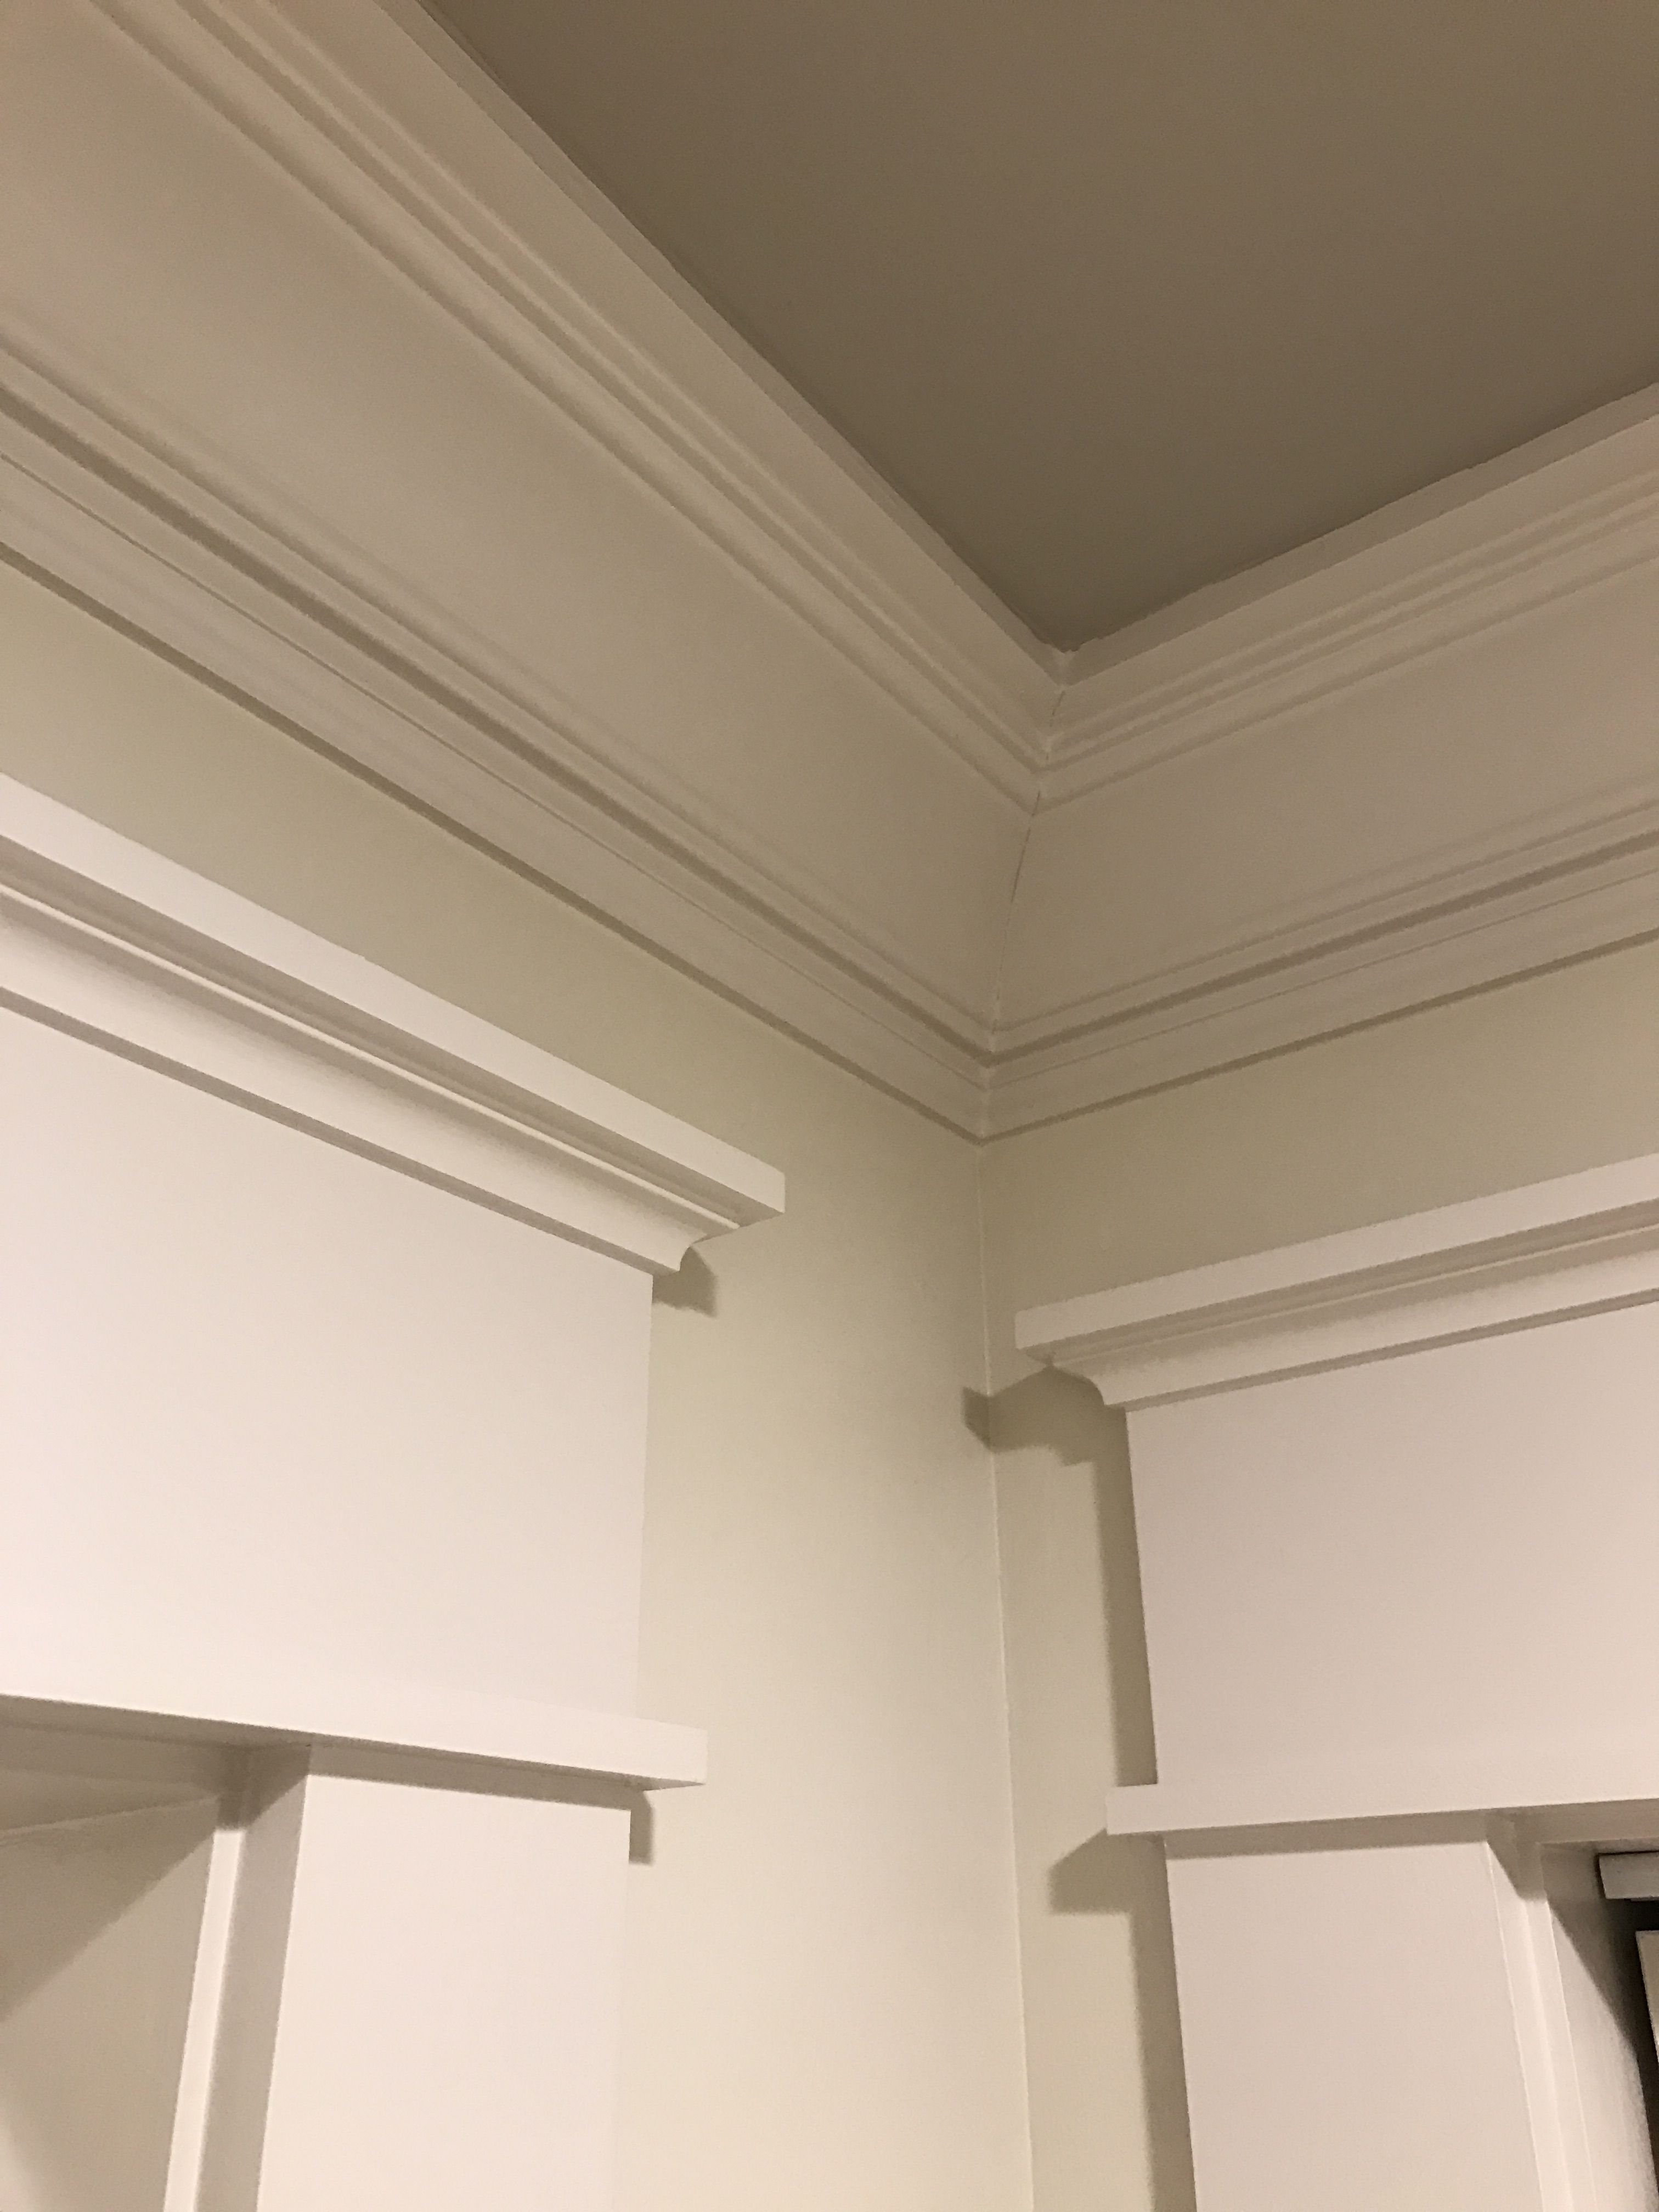 Delicieux Completed Craftsman Inside Corner Showing 3 Piece Crown Mold And Door  Headers